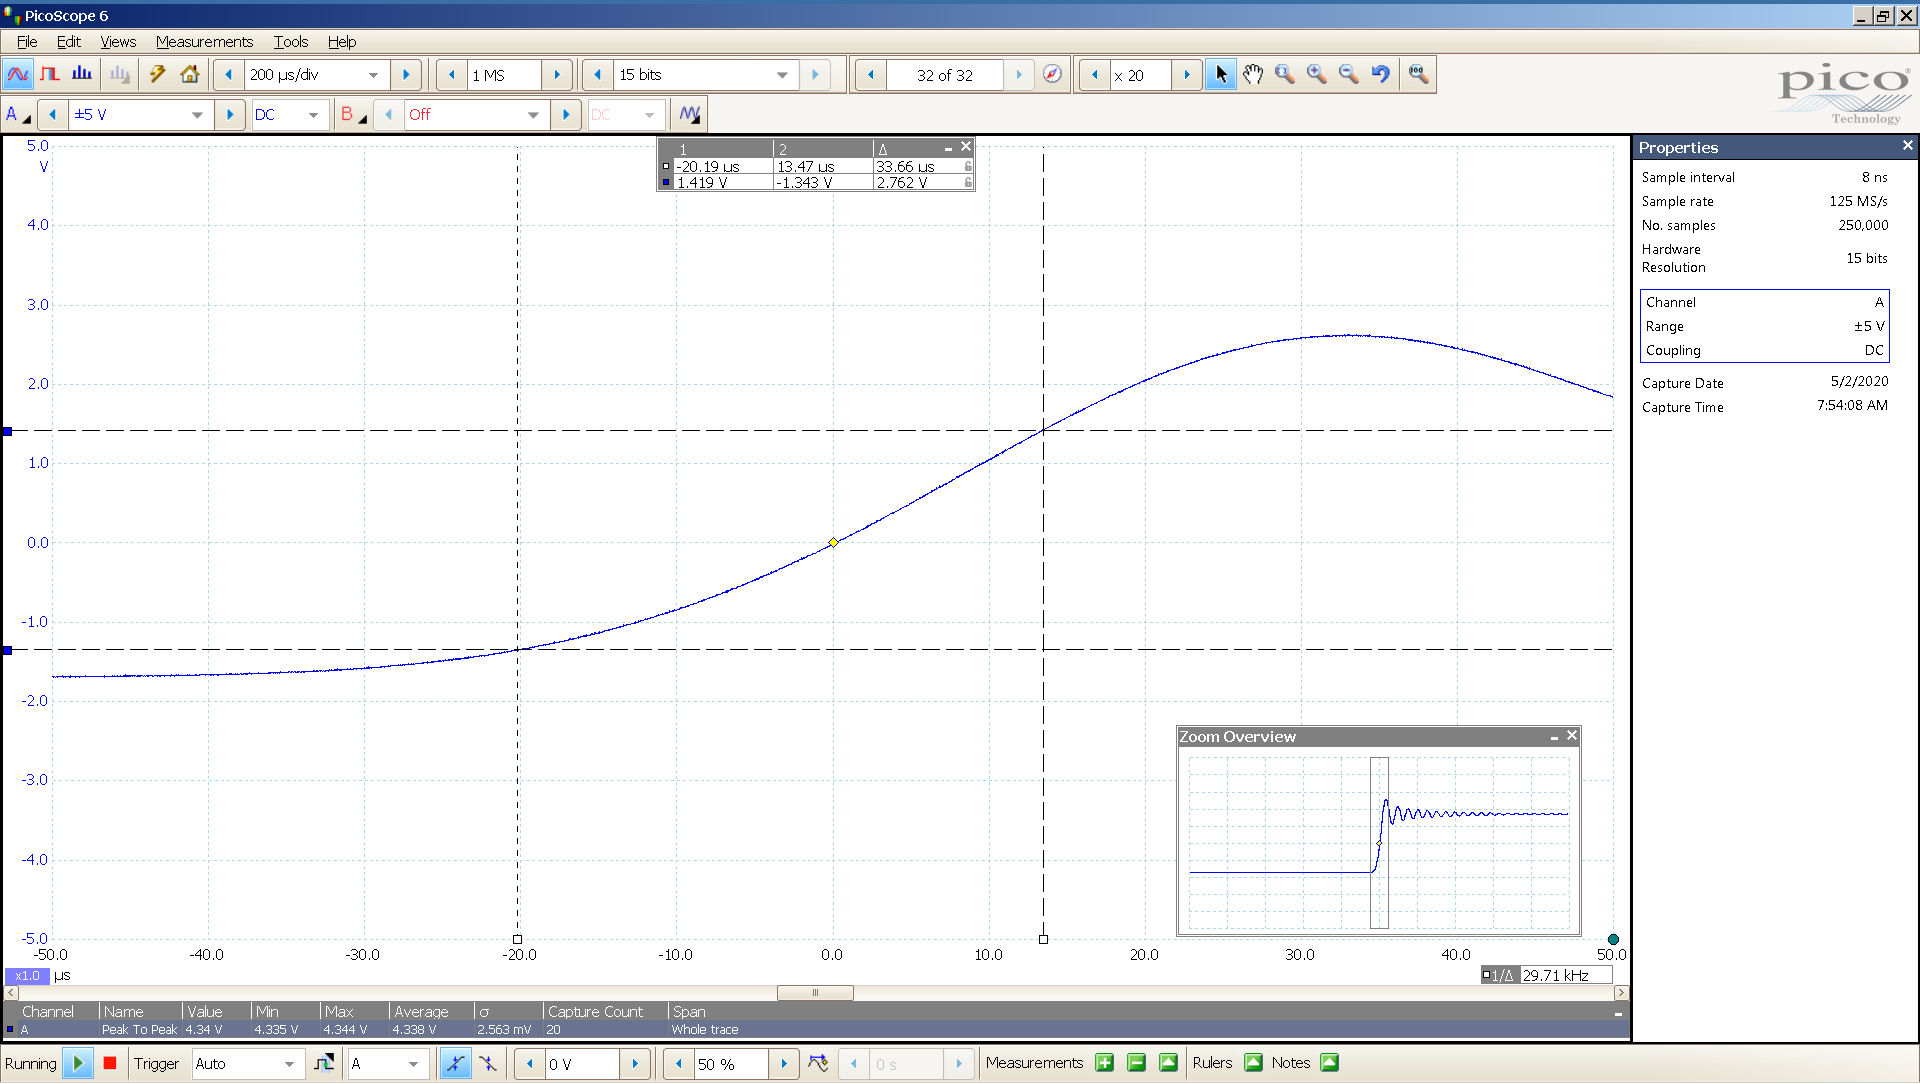 20200502-10 KTE Spring2 20 Hz sqr -4 dBFS 4 Vpp 200uS div SE - ASIO - OS - BW calc.png